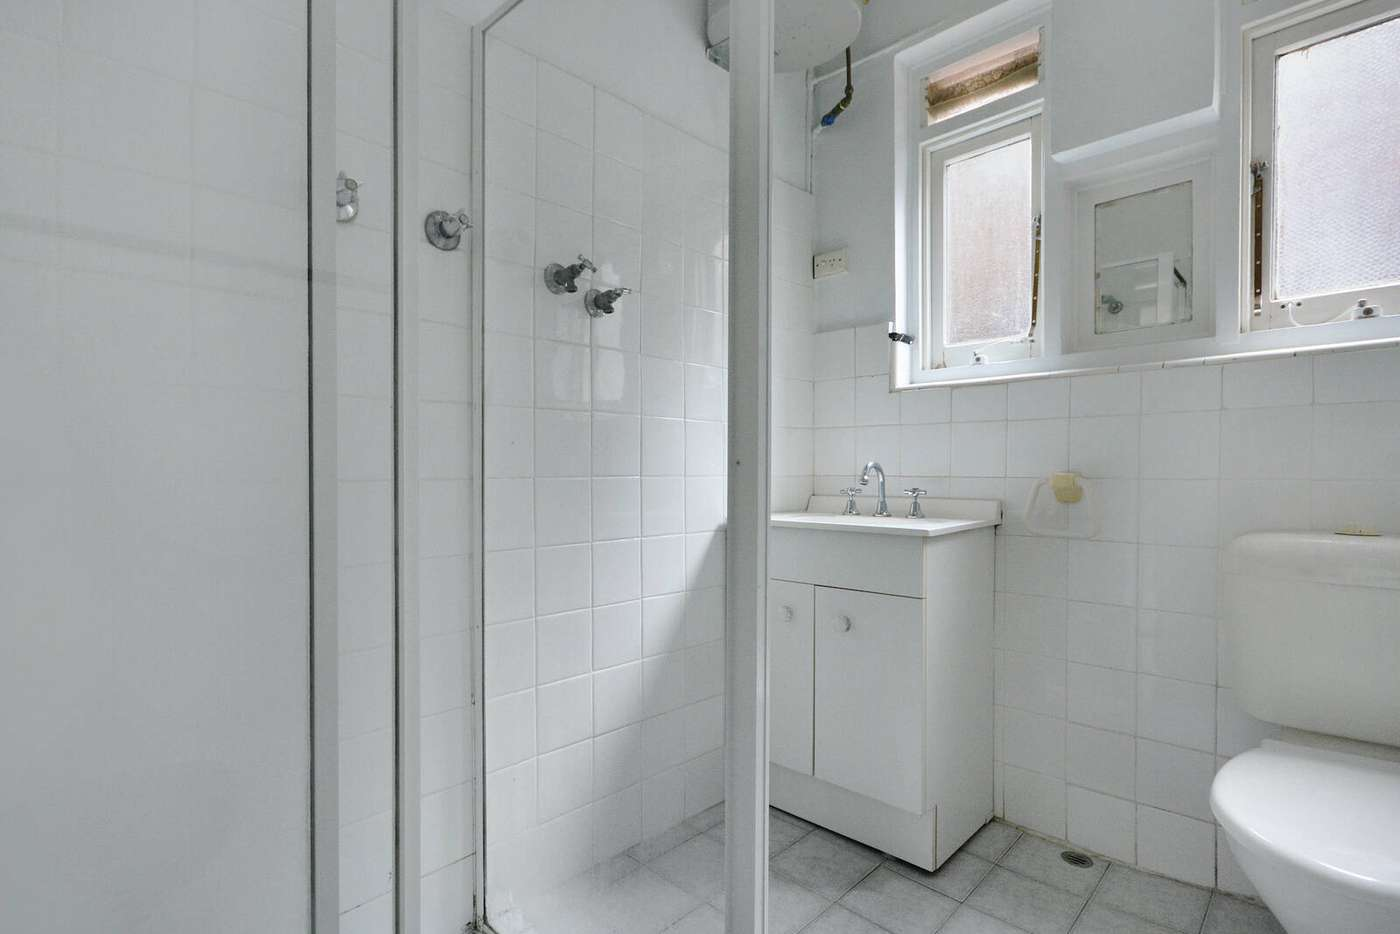 Seventh view of Homely apartment listing, 1/1 Ben Eden Street, Bondi Junction NSW 2022